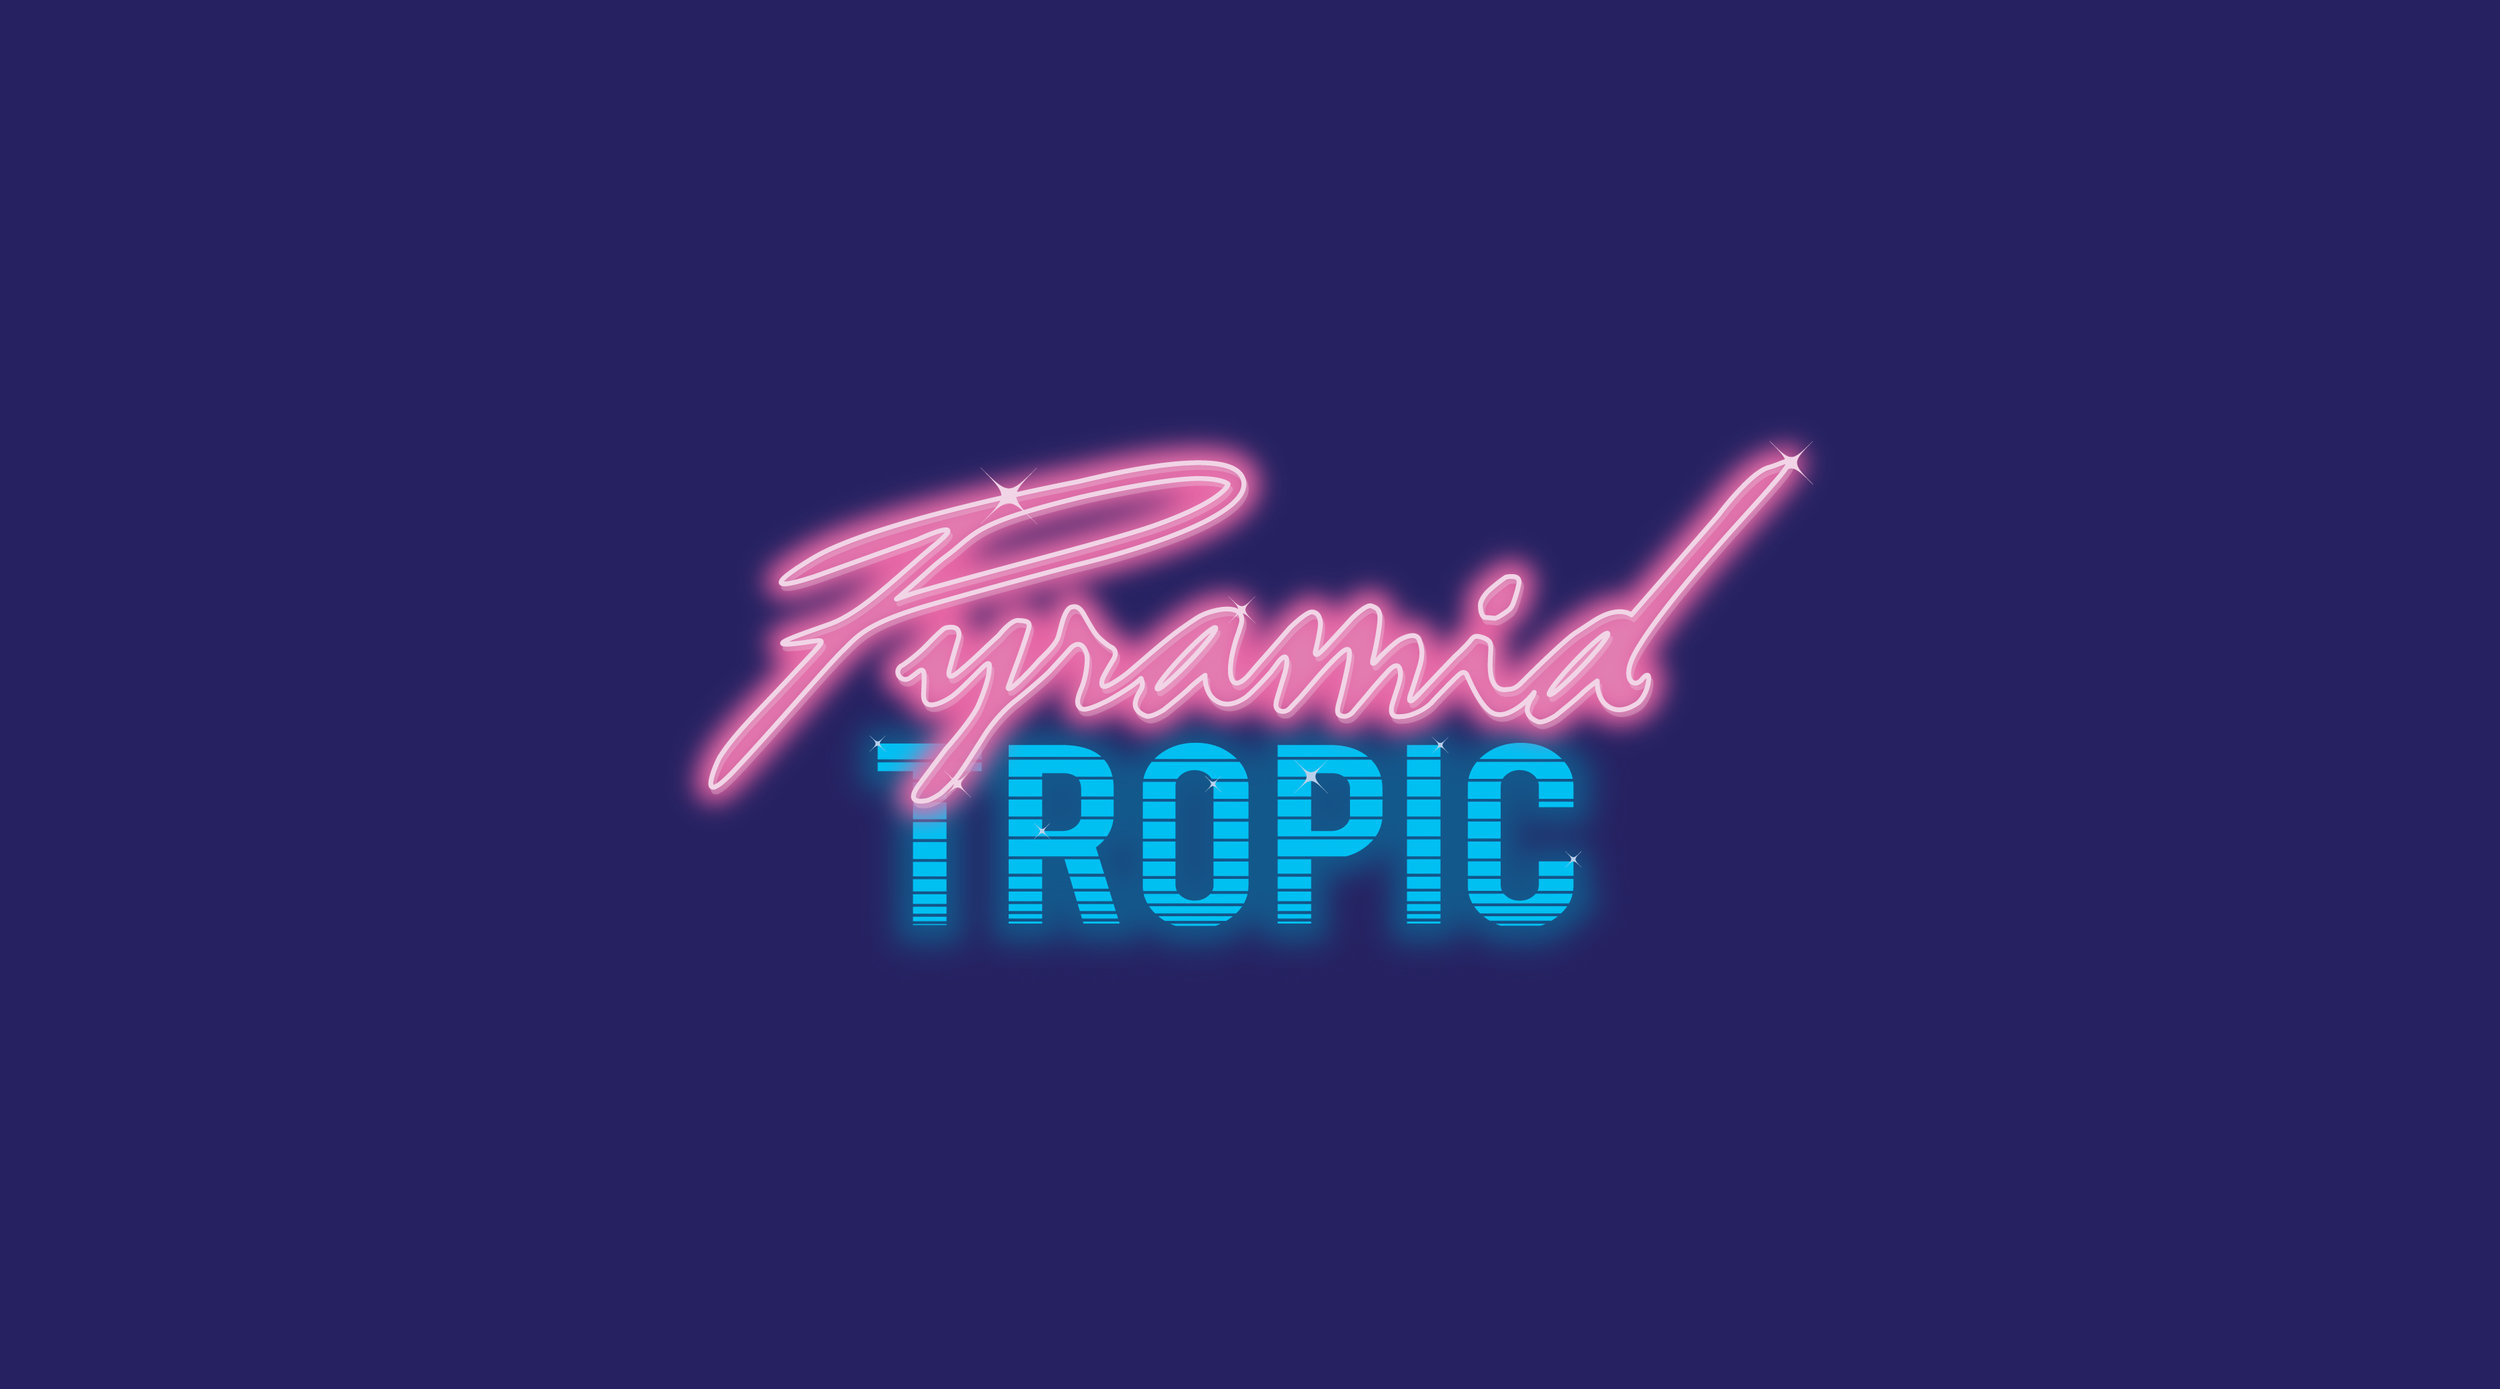 Pyramid Tropic